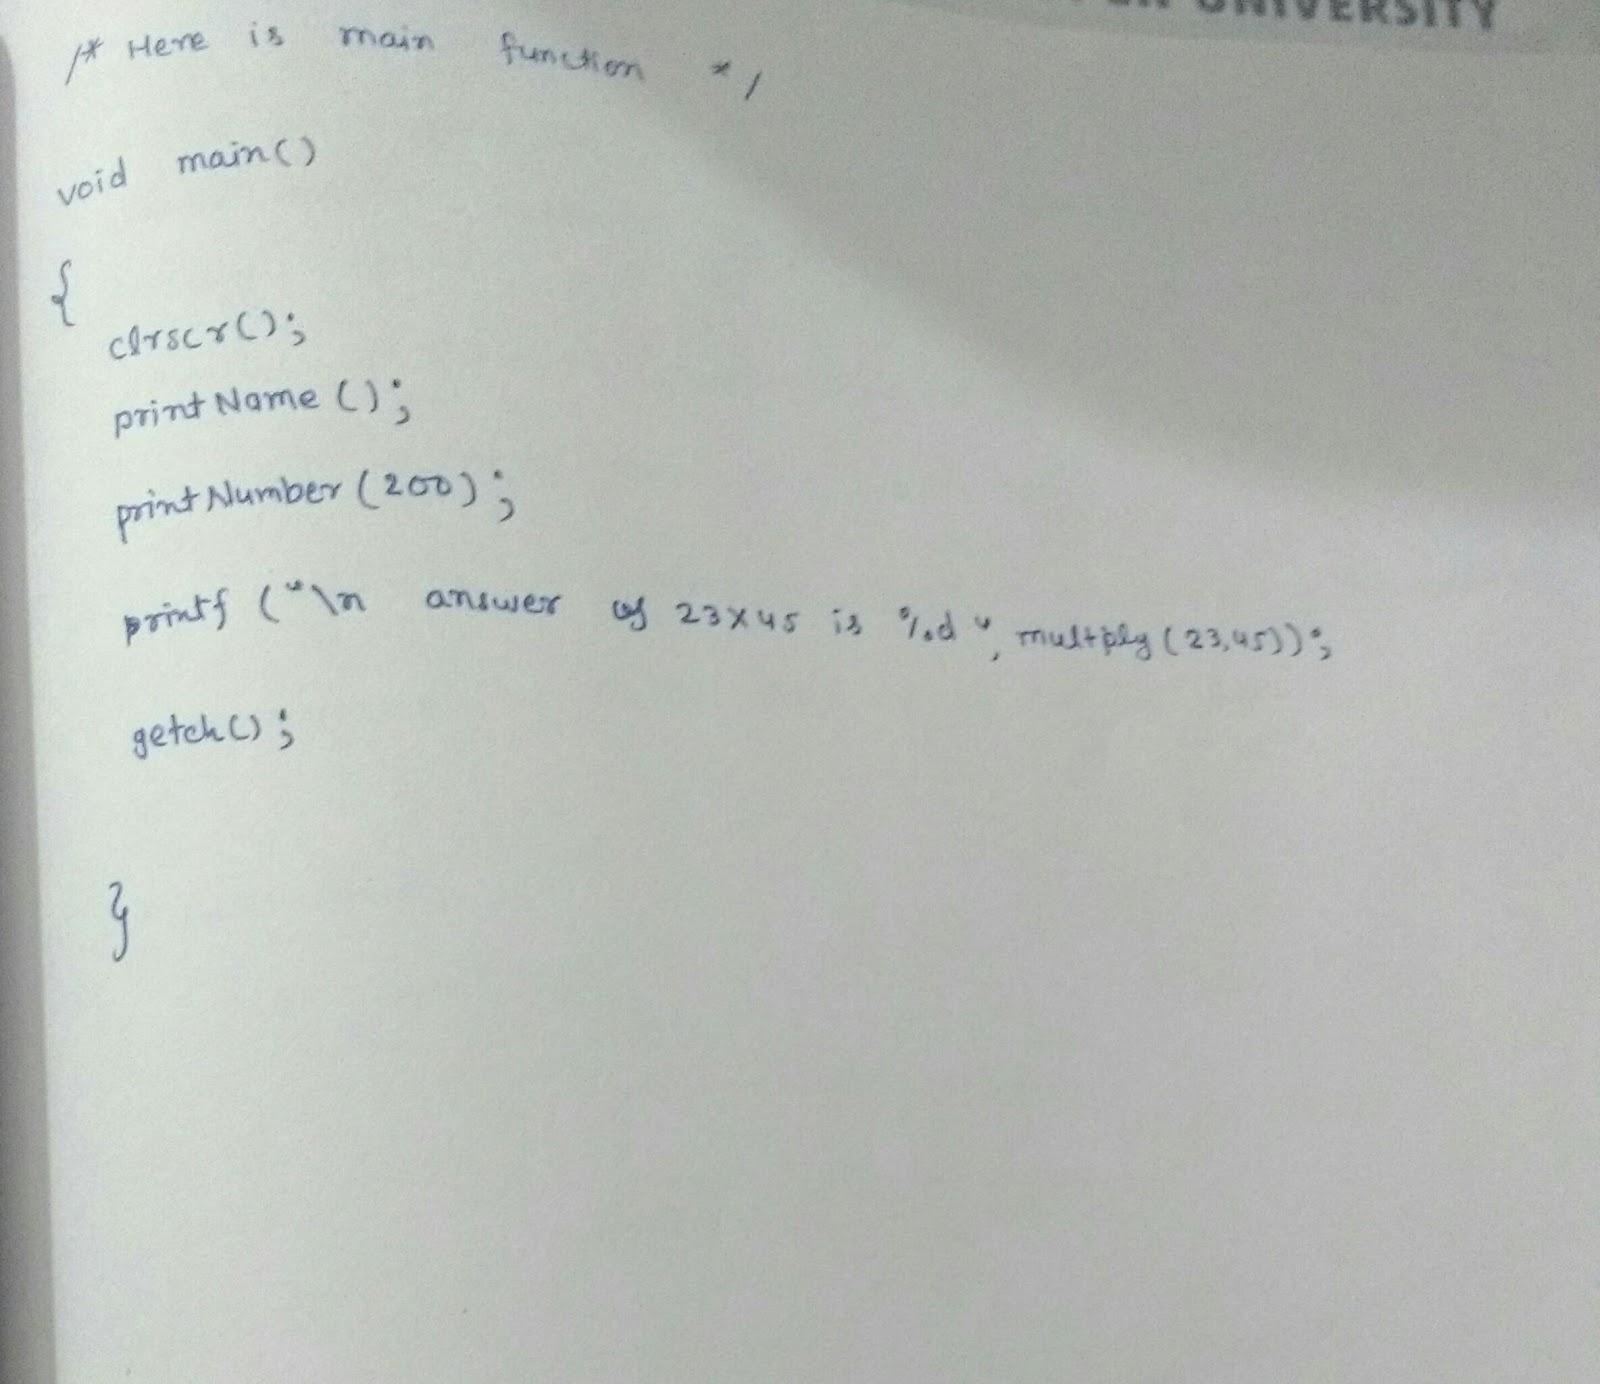 IELTS - 网络学习资源 雅思考试中文官方网站 for Prepare